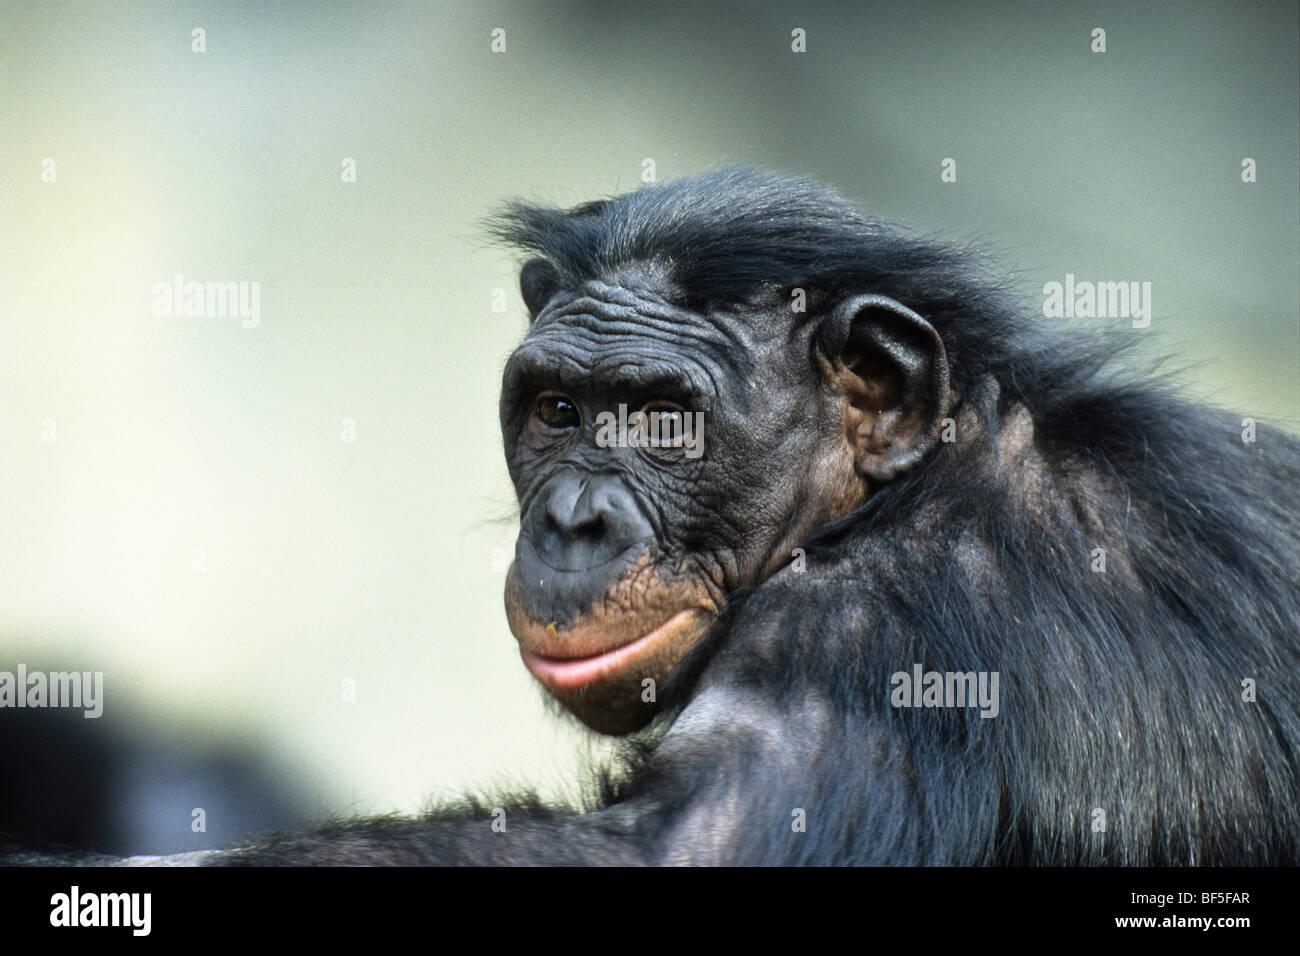 Bonobo, Chimpanzee (Pan paniscus), Africa - Stock Image